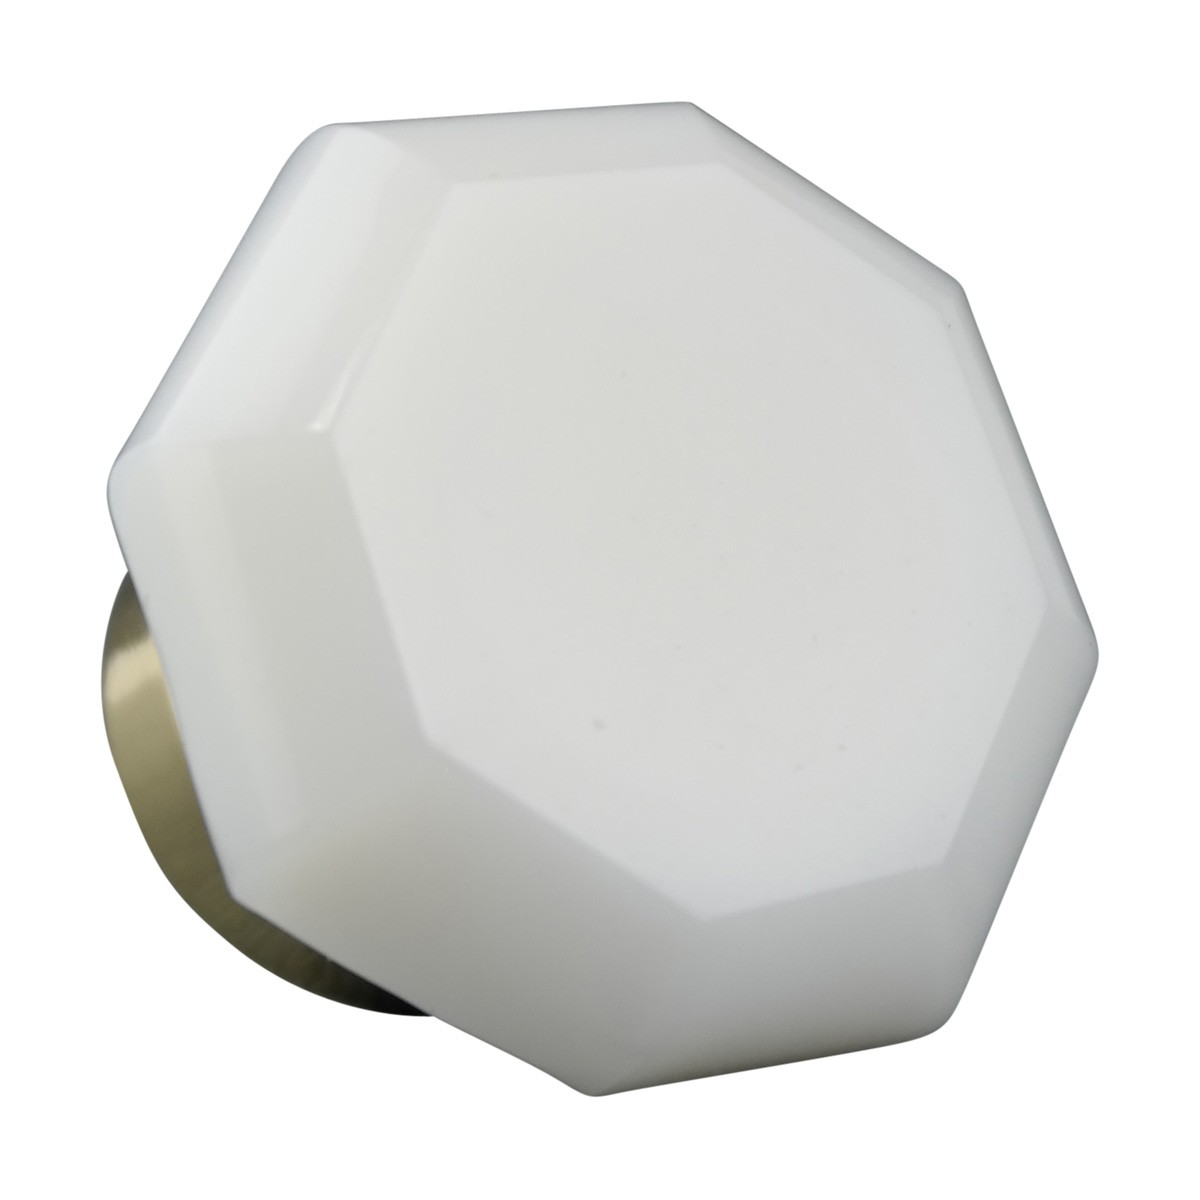 Cabinet Knob Milk Glass 1 Dia W Brass Back Round Kitchen Cabinet Knob Brass Cabinet Knobs Vintage Dresser Hardware Knobs